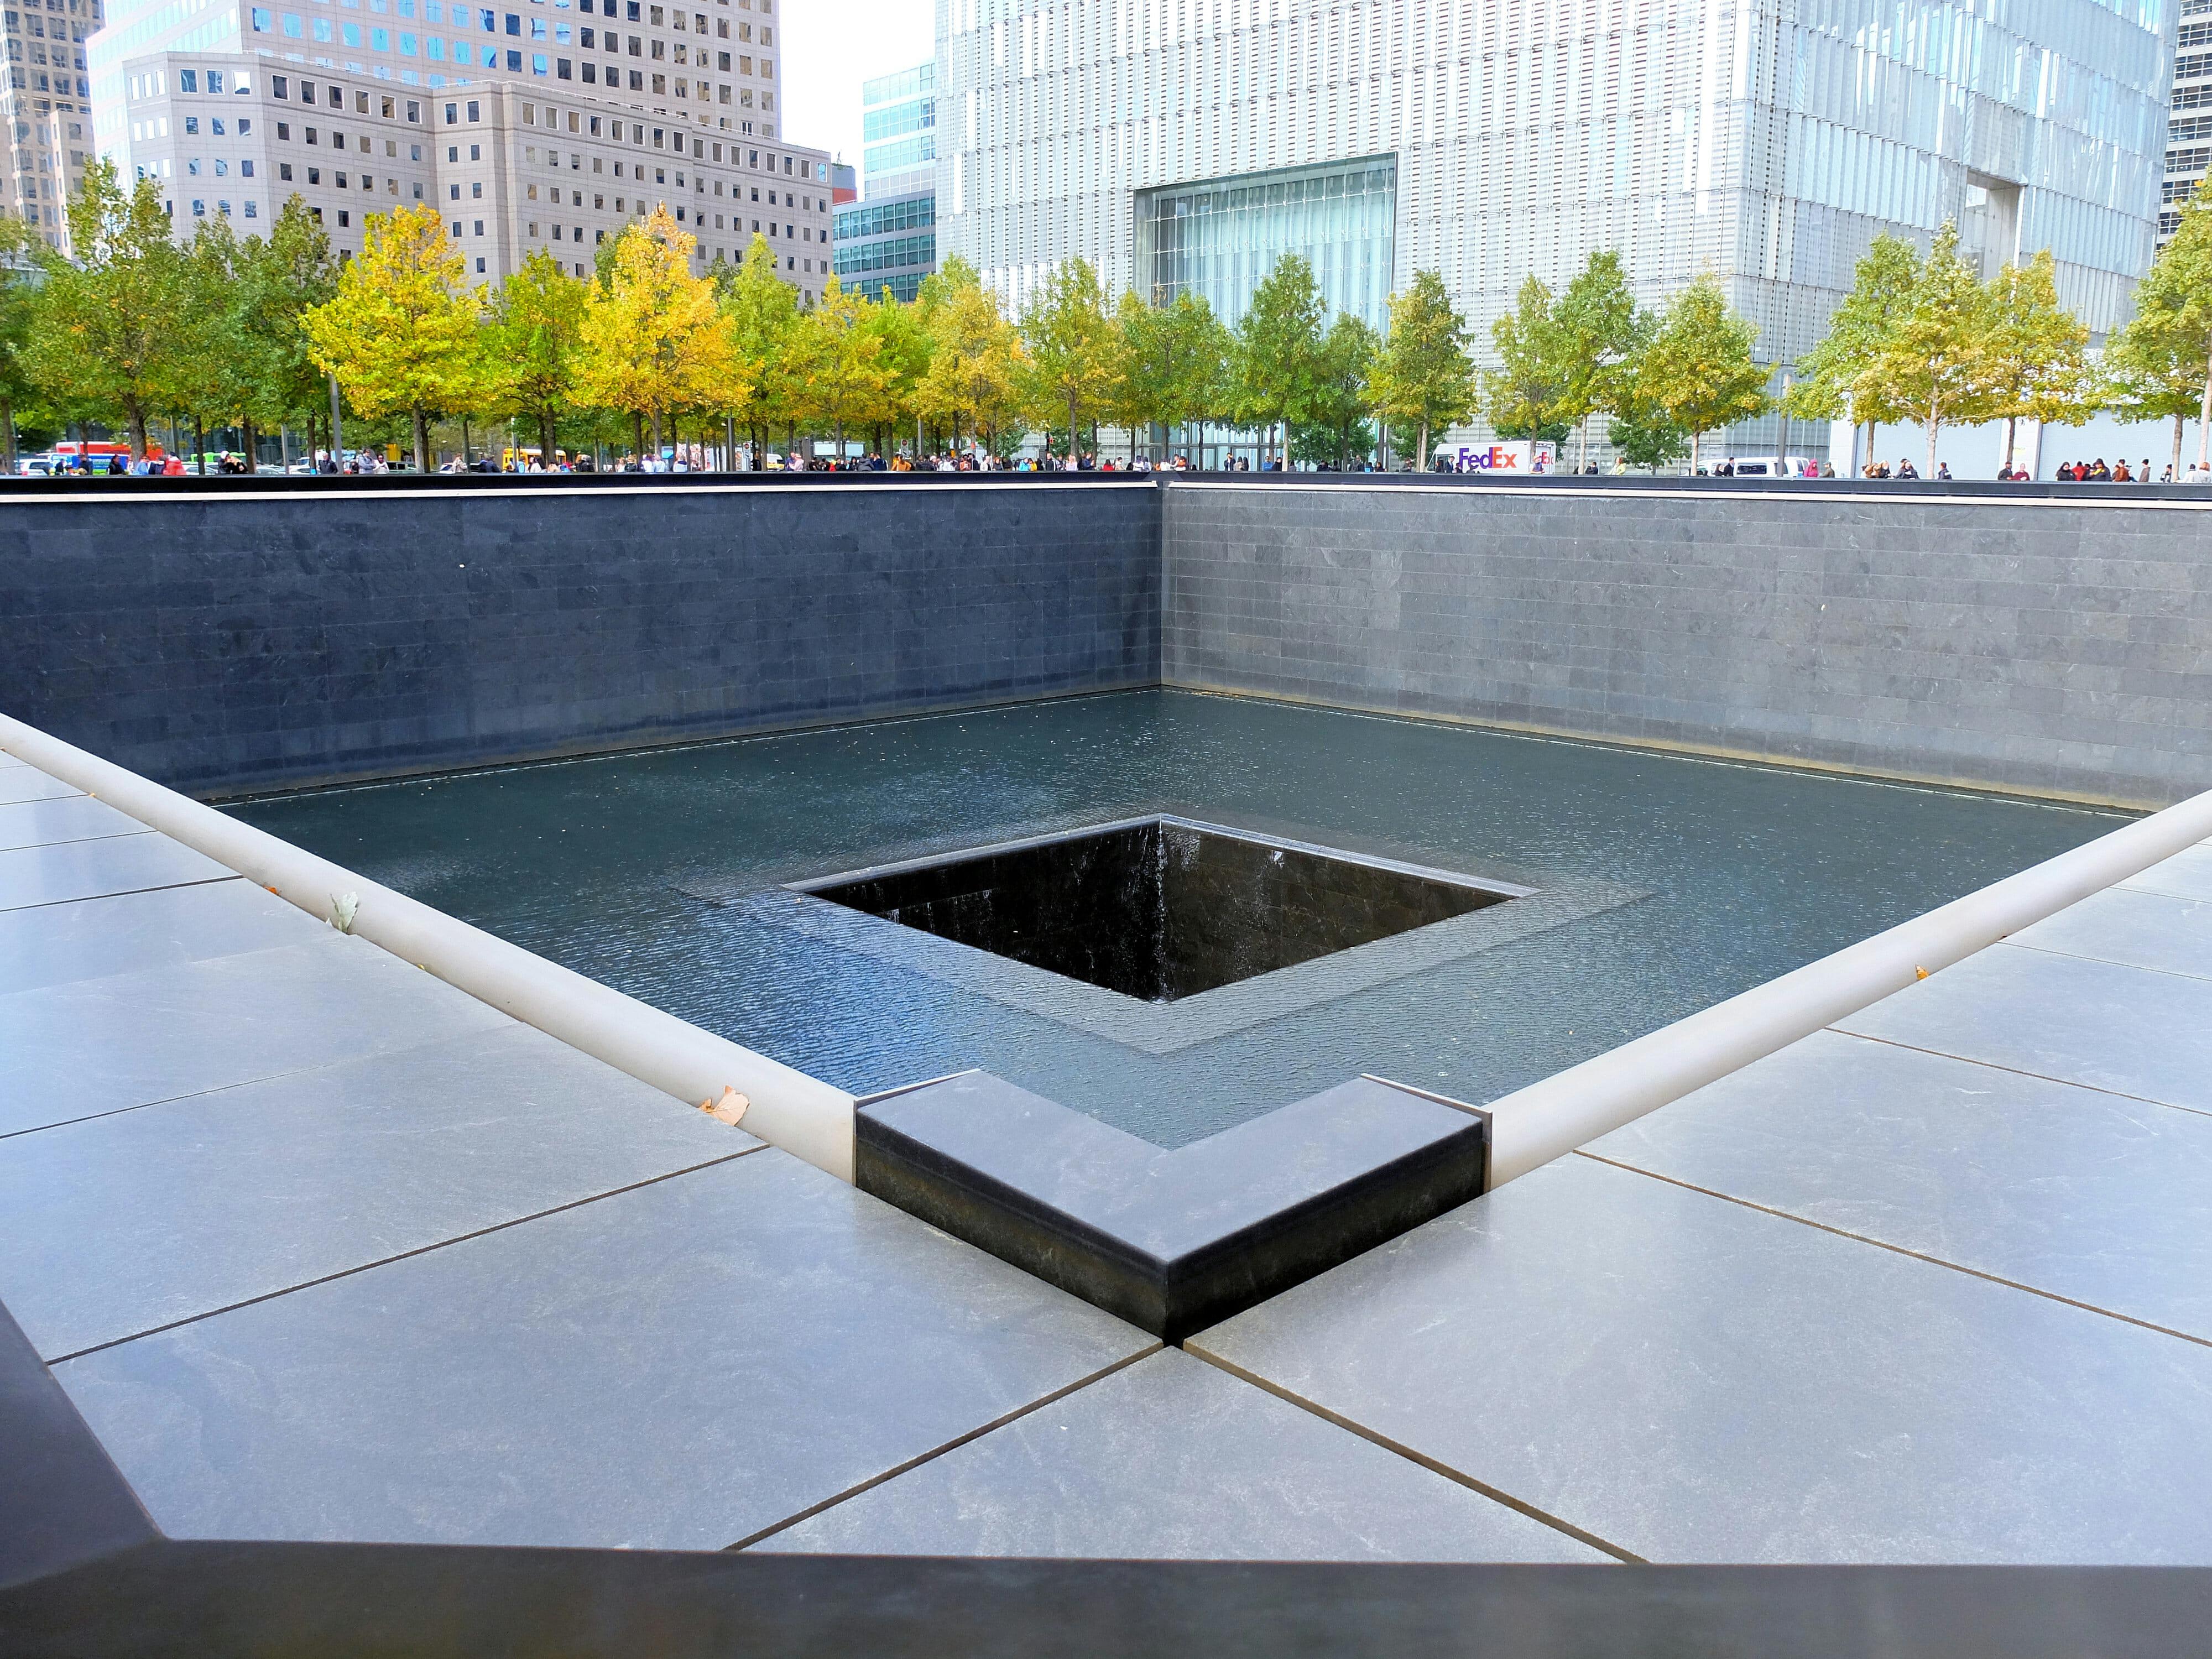 911 Memorial in New York High Quality Wallpaper